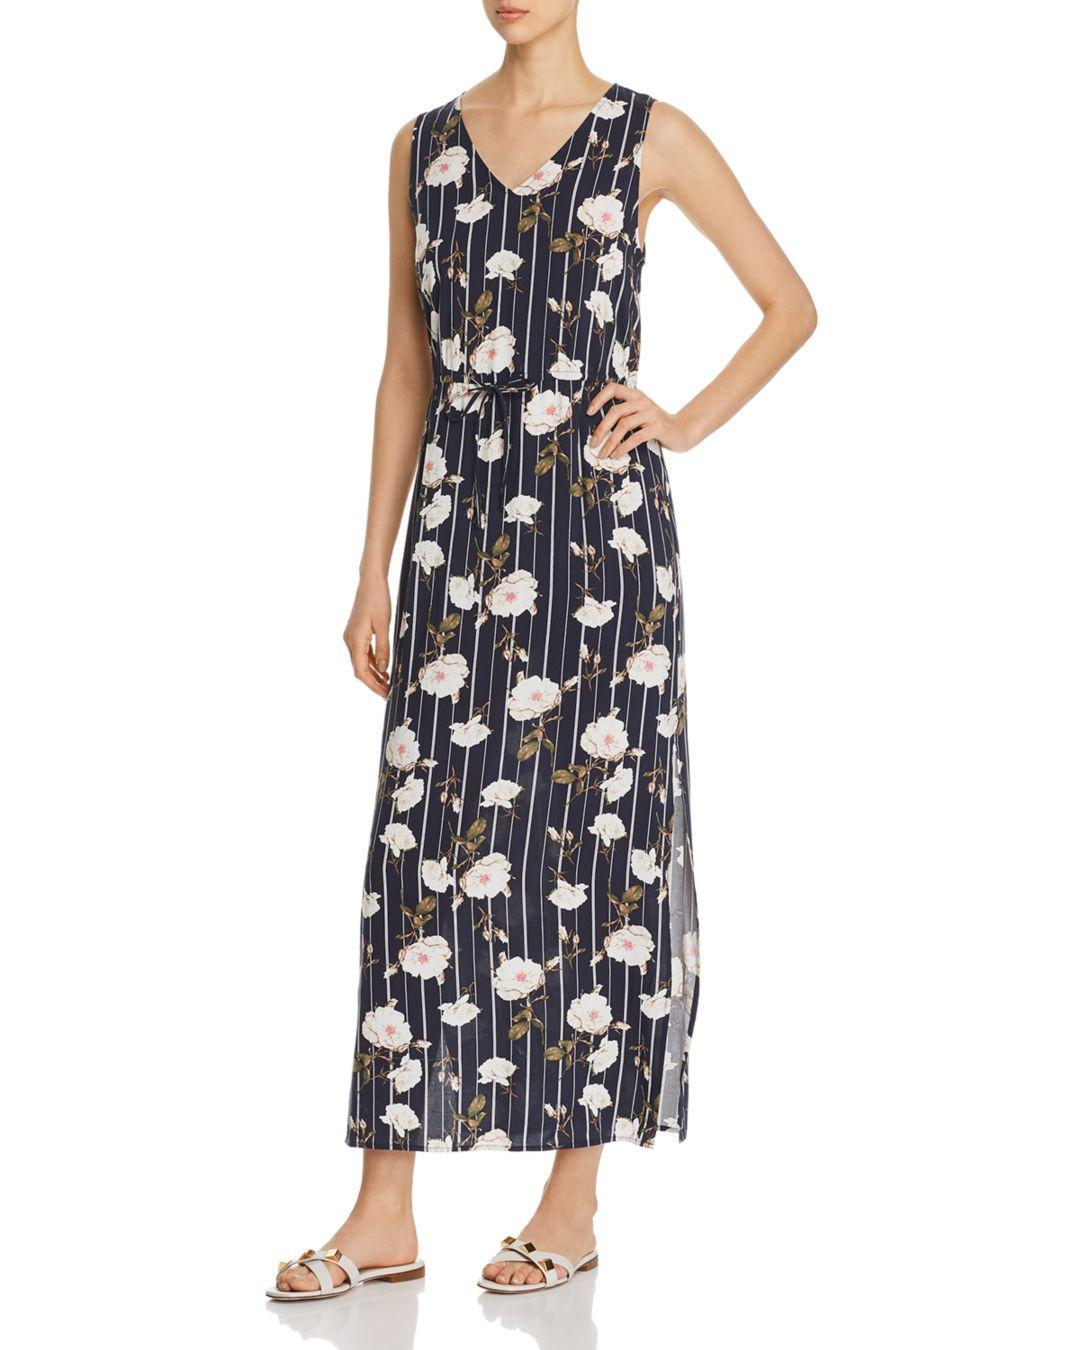 547bb9fd47d Vero Moda. Women s Floral Maxi Dress